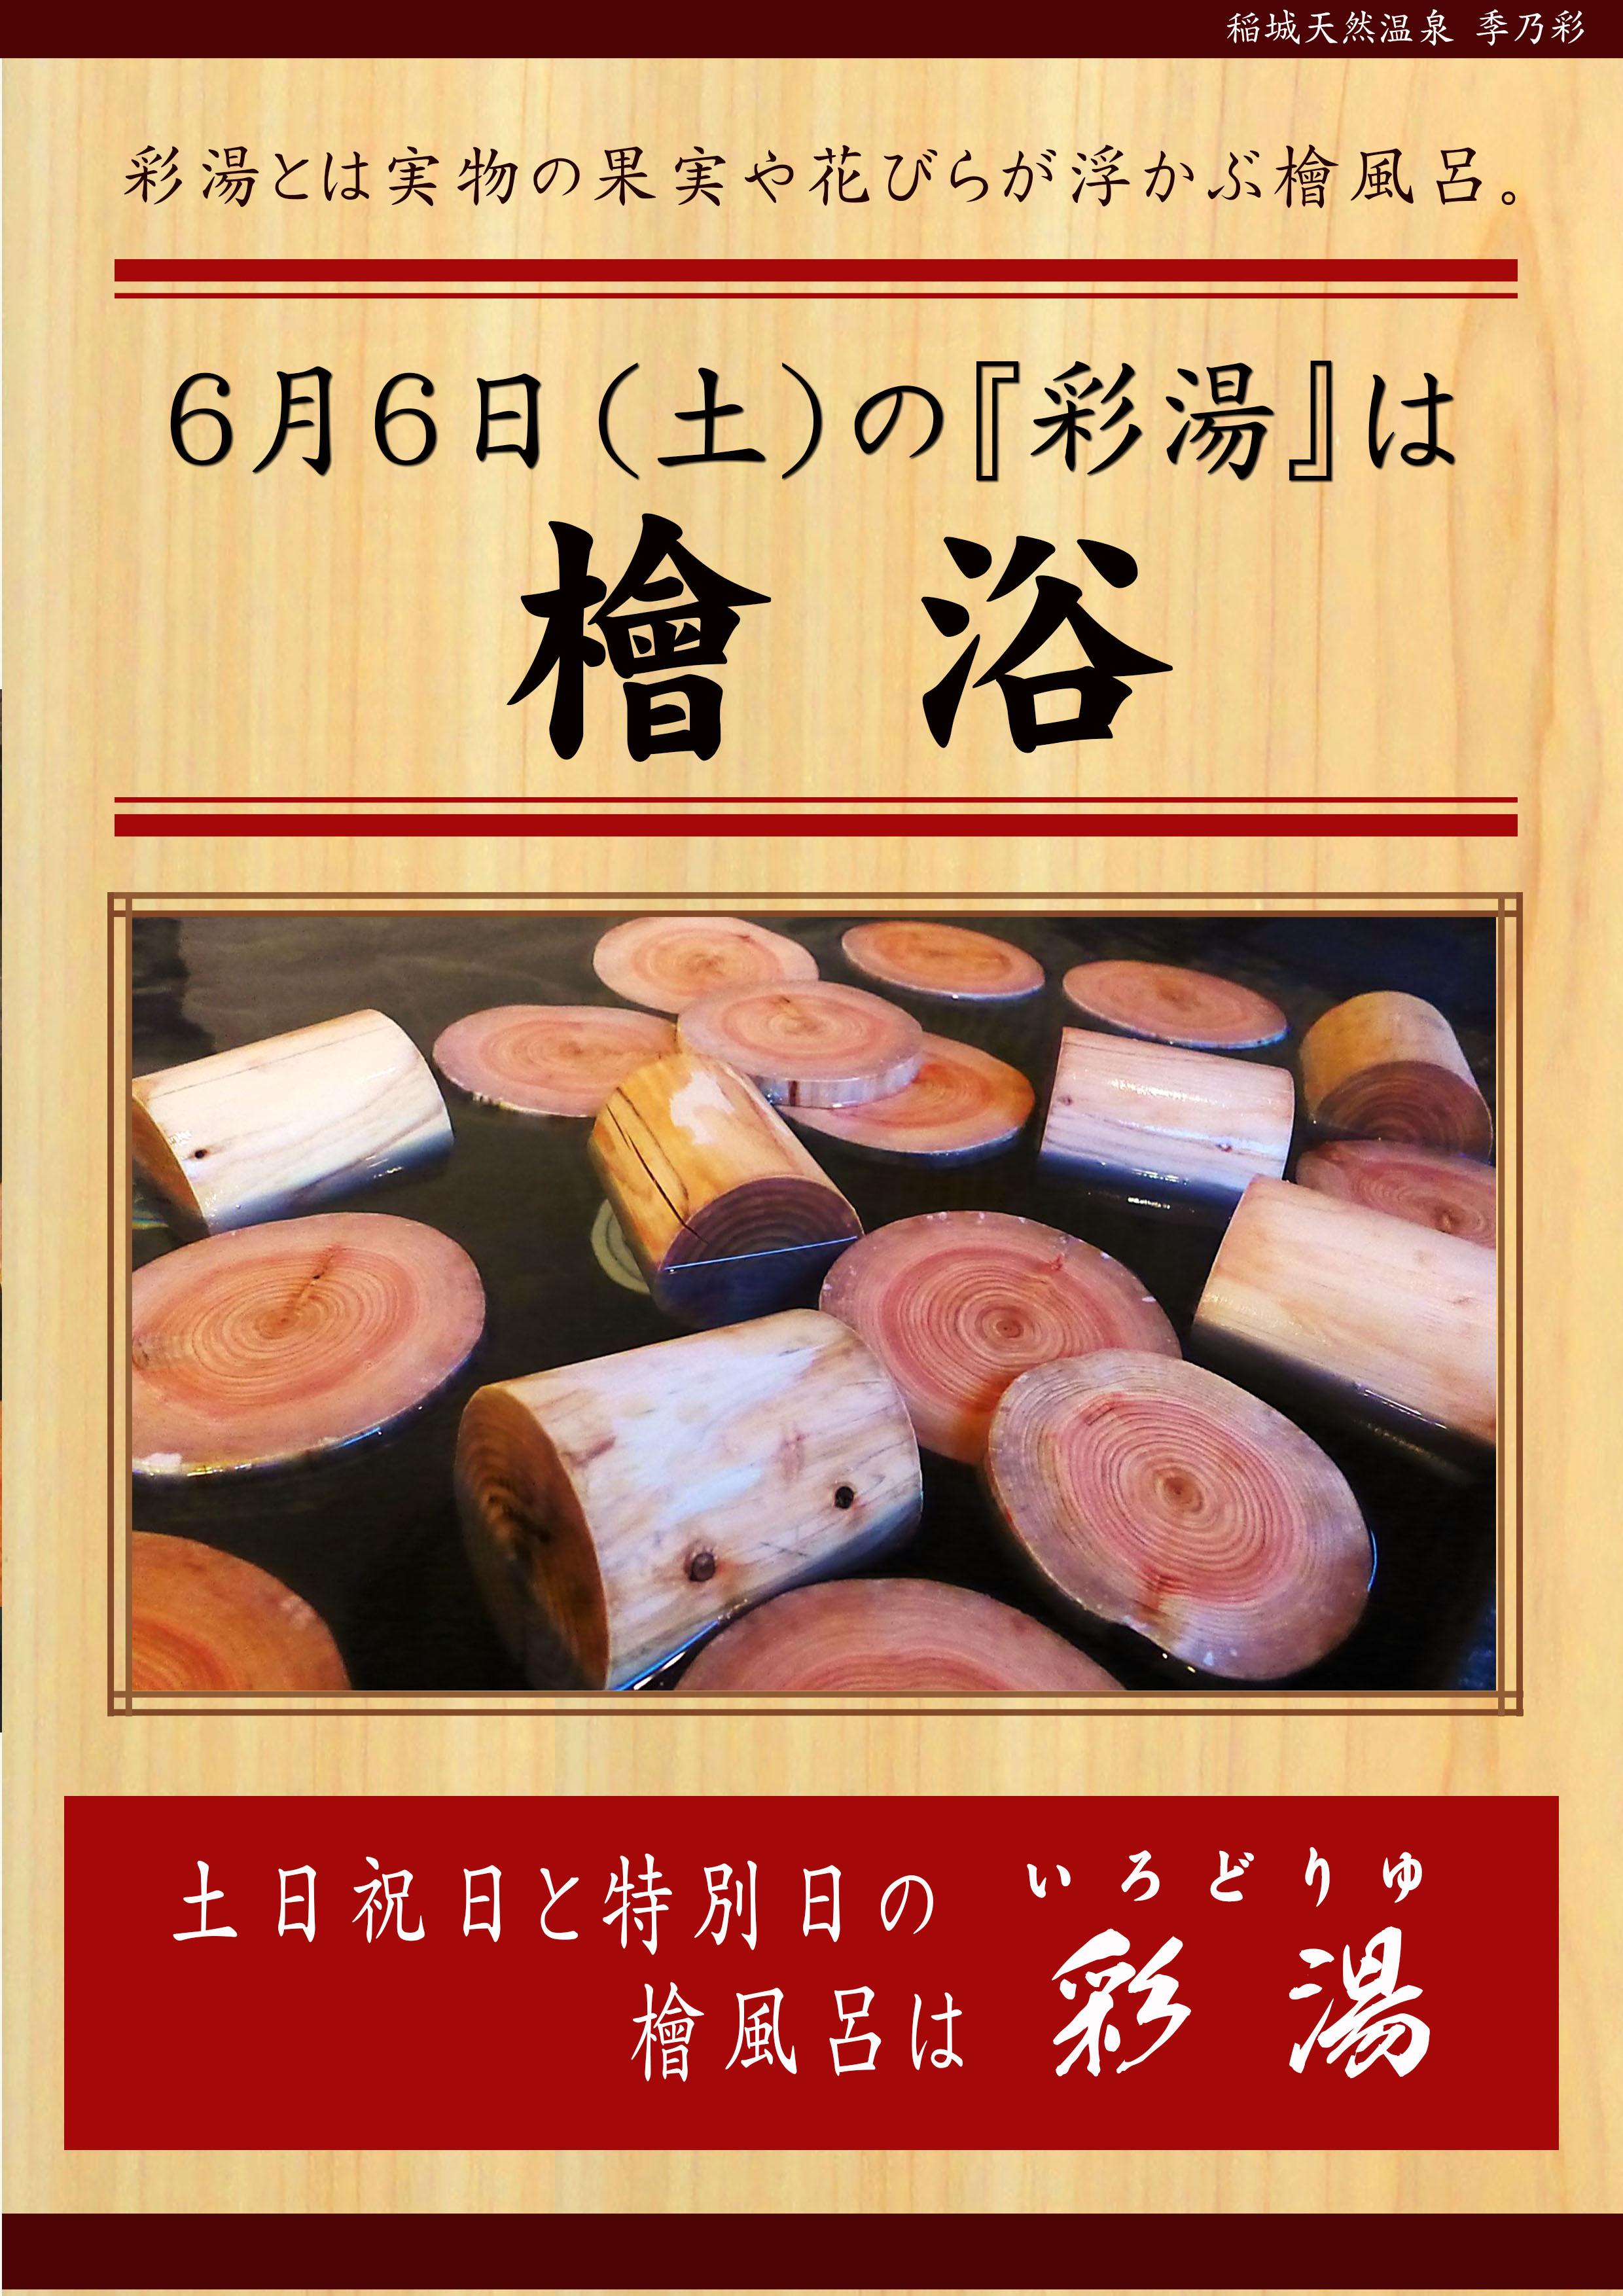 200601 POP イベント 彩湯 男女 檜浴